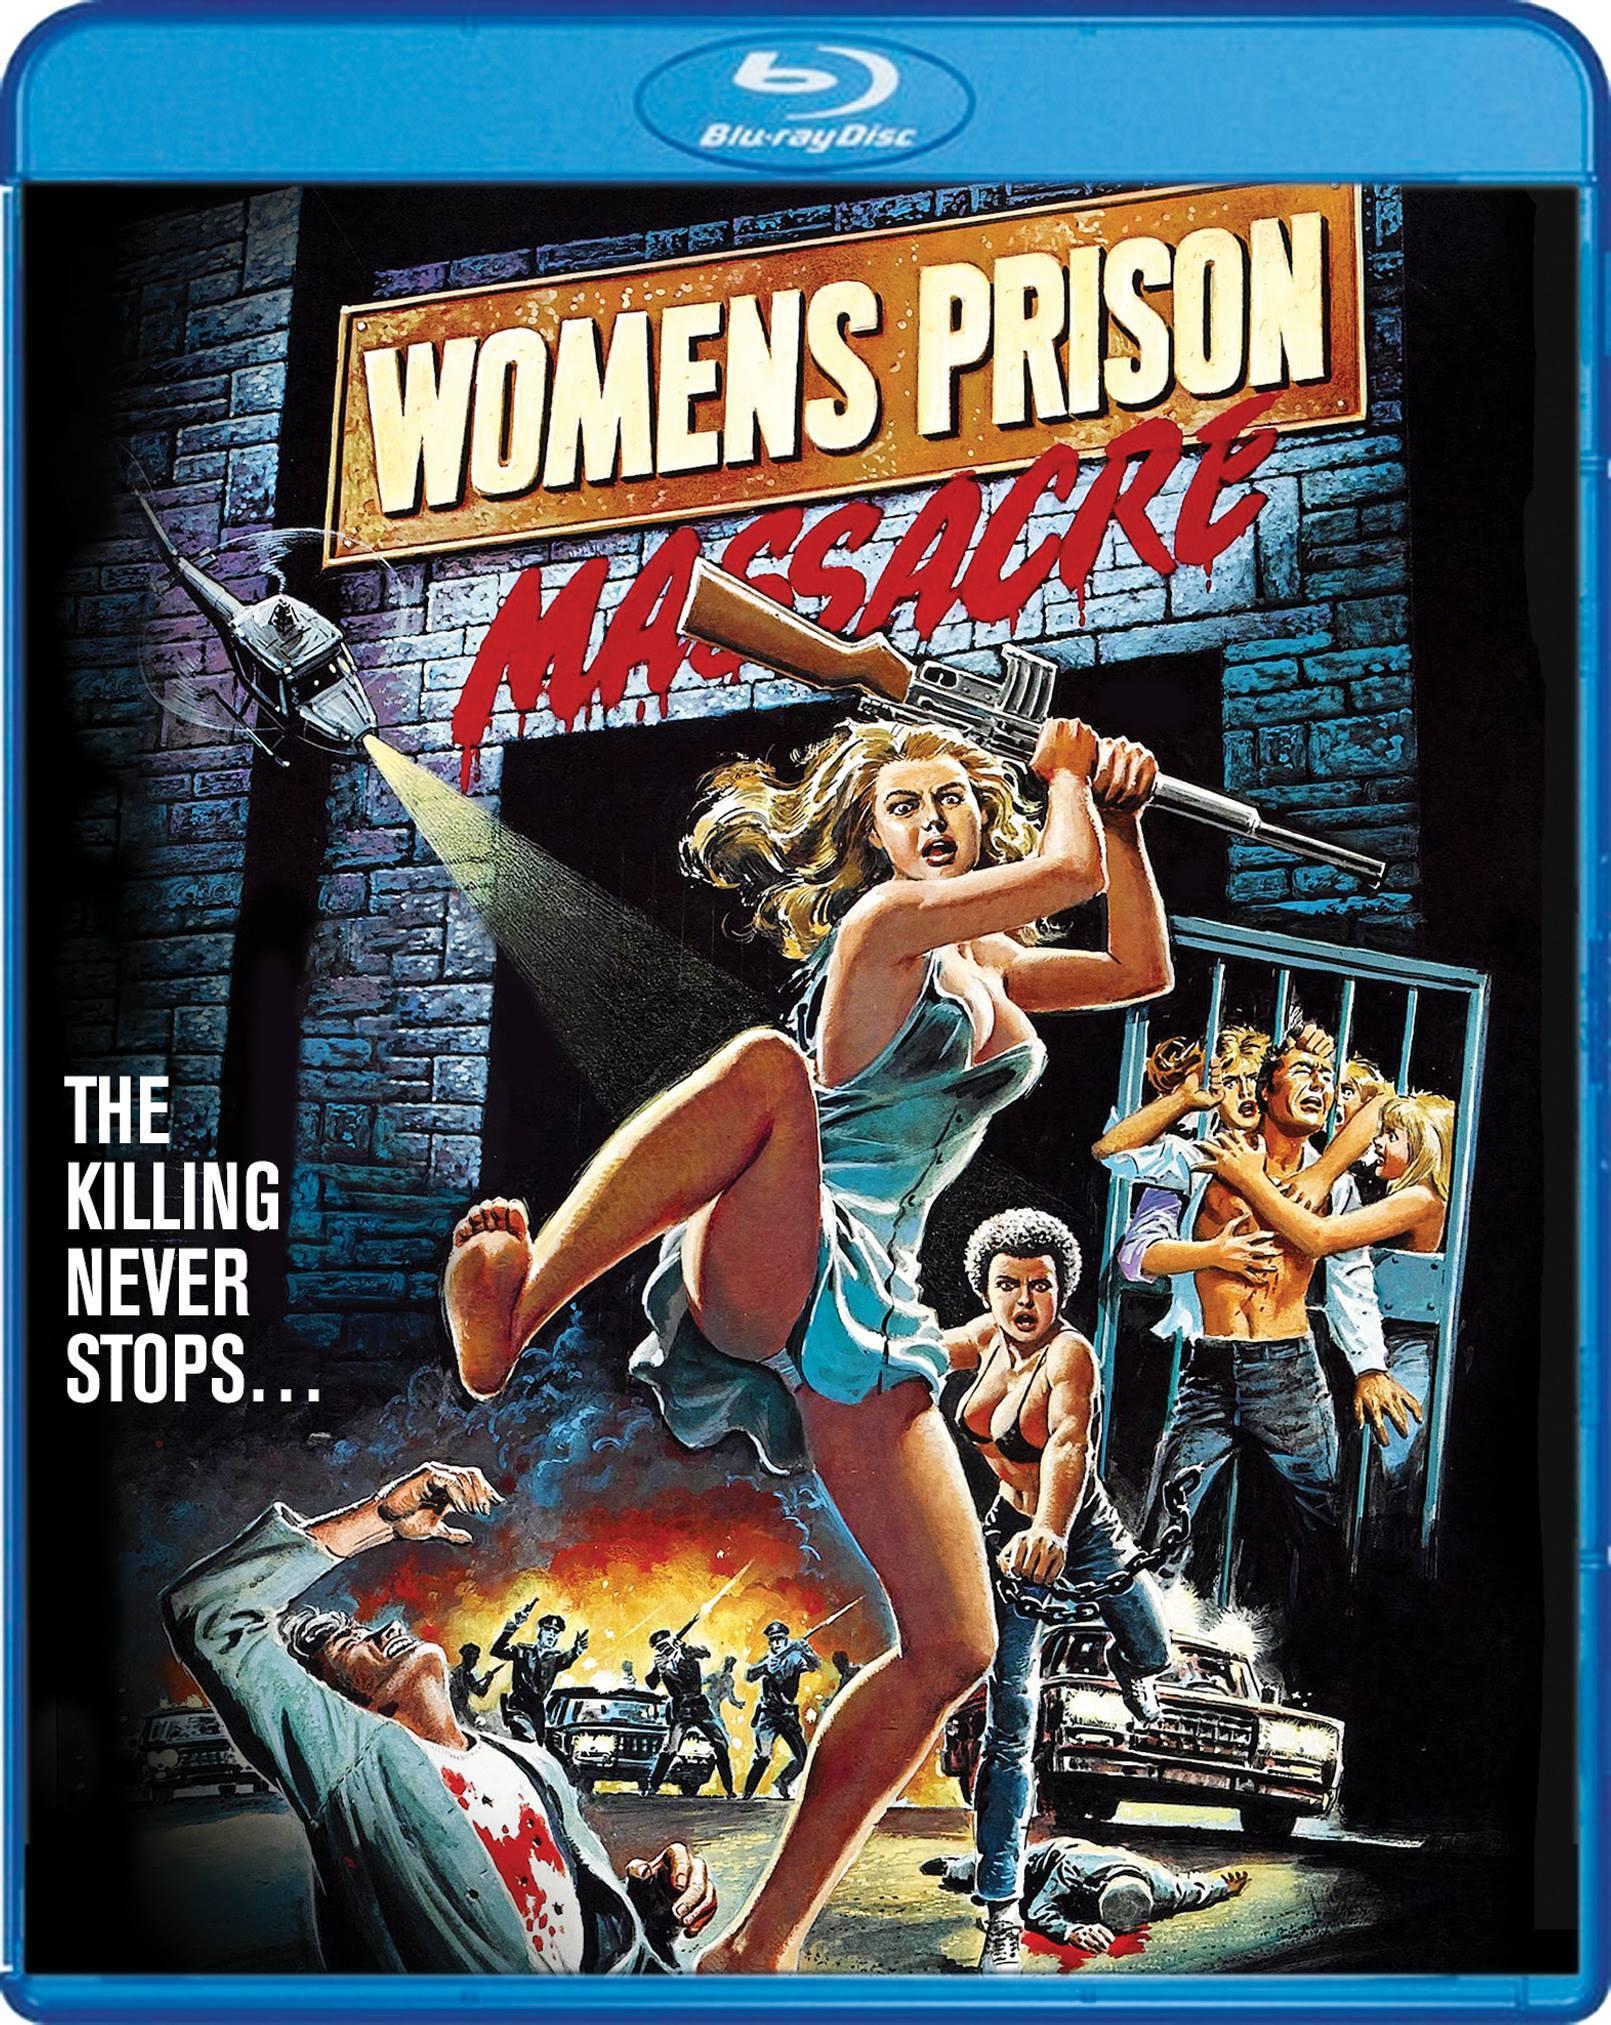 Women's Prison Massacre (1983) Blade Violent - I violenti